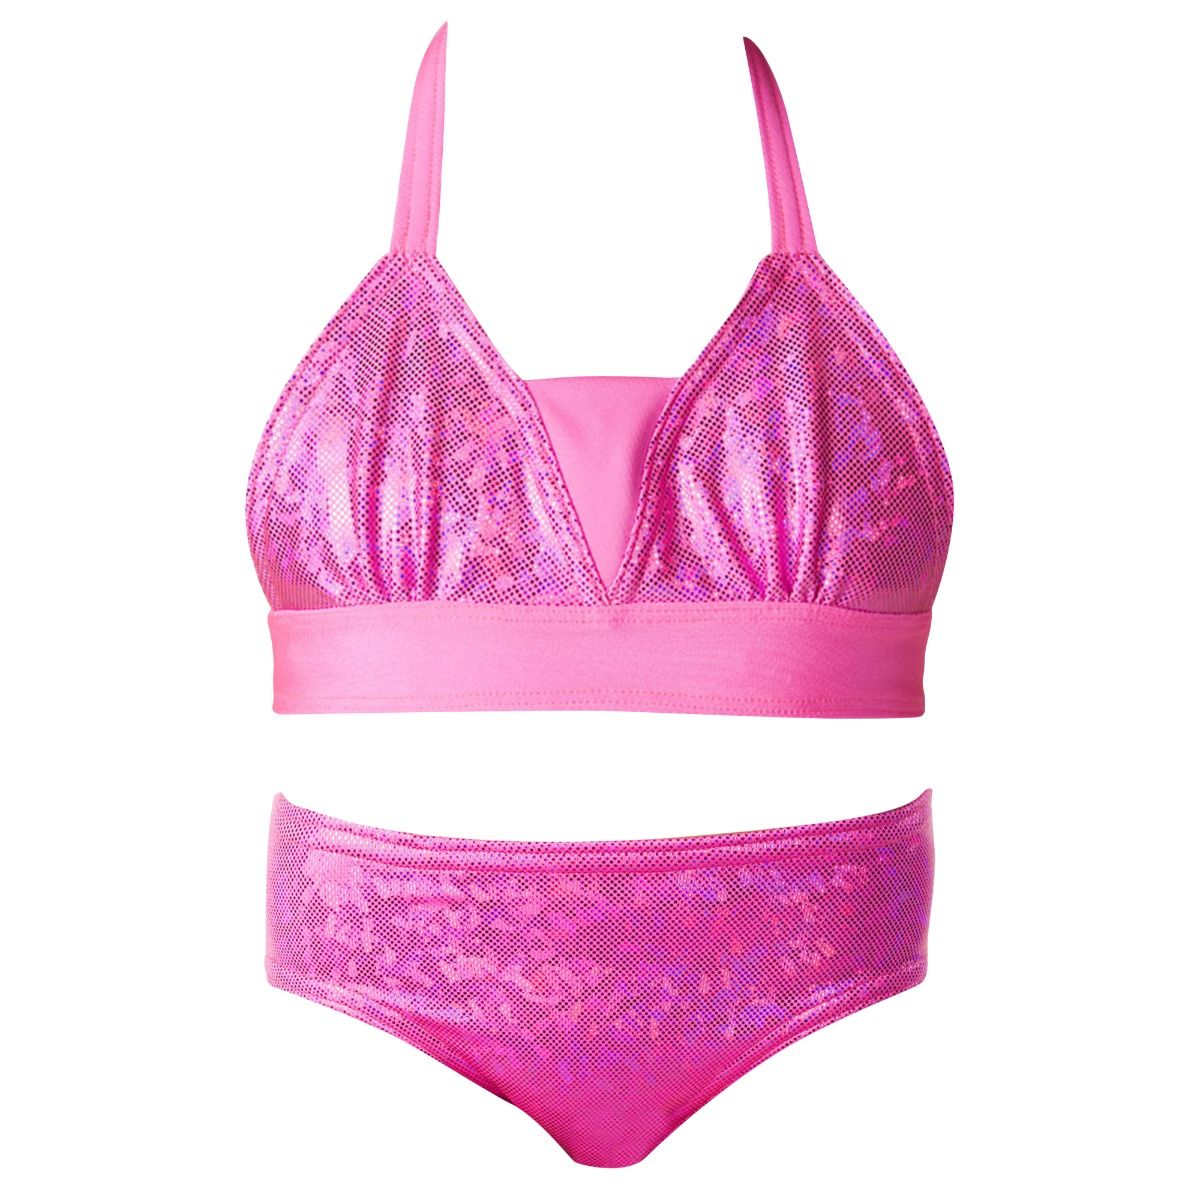 0a8a1f7389e Sparkly Mermaid Bikini Swimwear